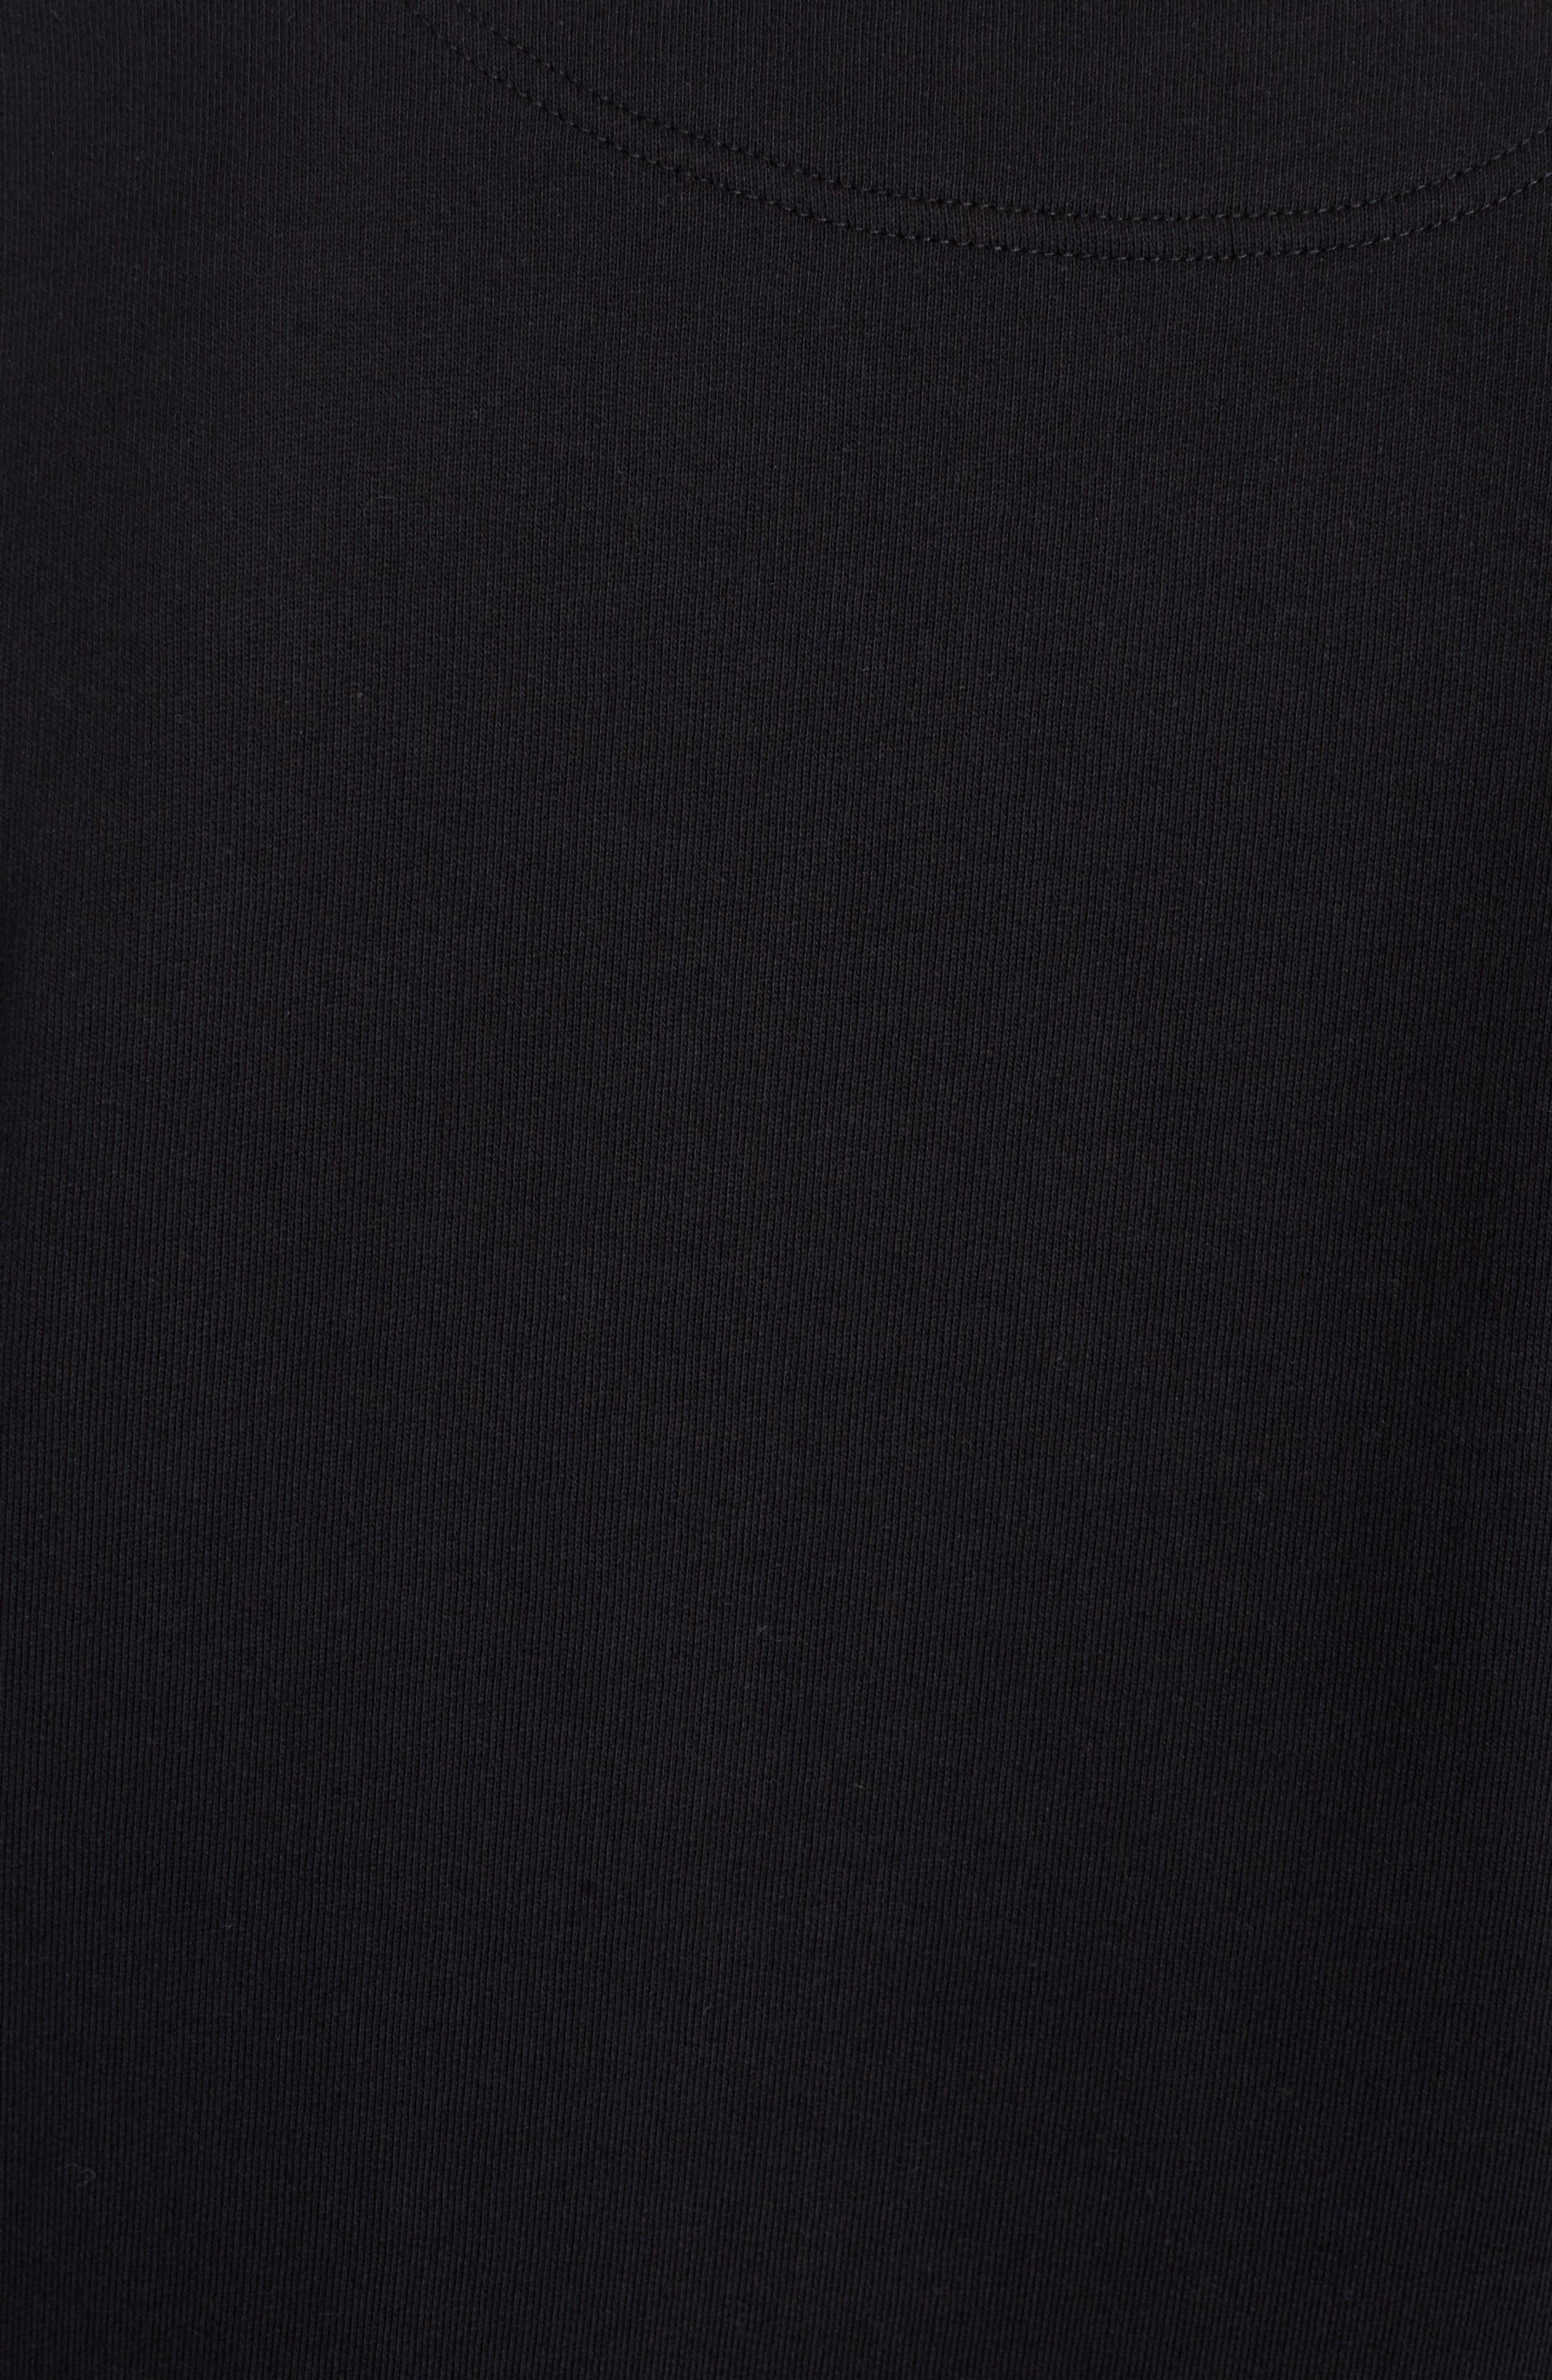 Embroidered Eye Sweatshirt,                             Alternate thumbnail 5, color,                             Black